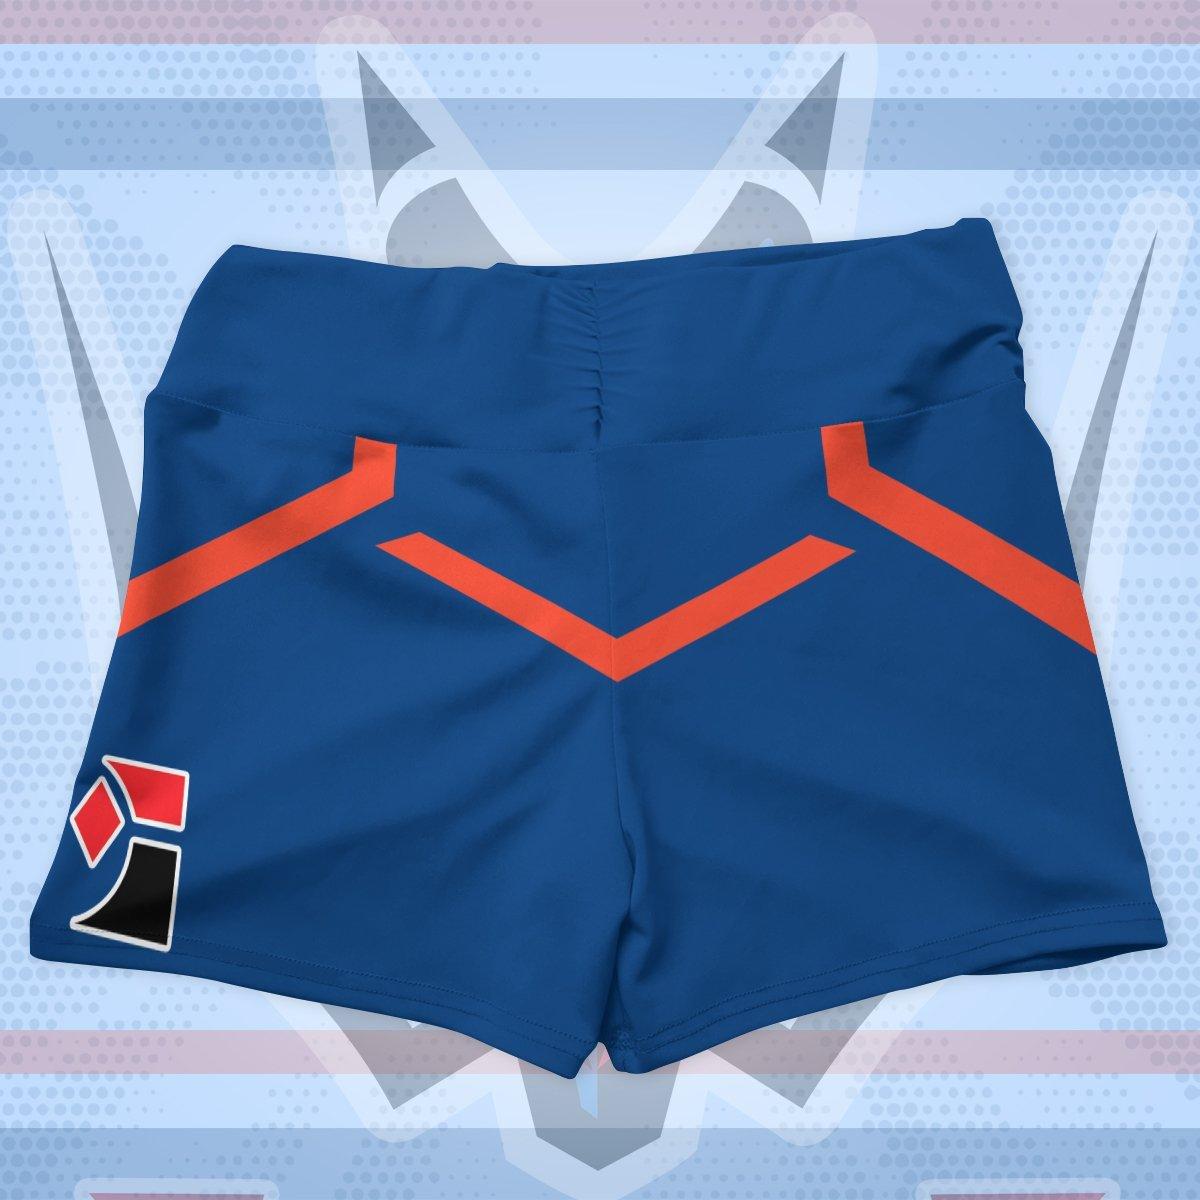 pokemon dragon uniform active wear set 385598 - Anime Swimsuits